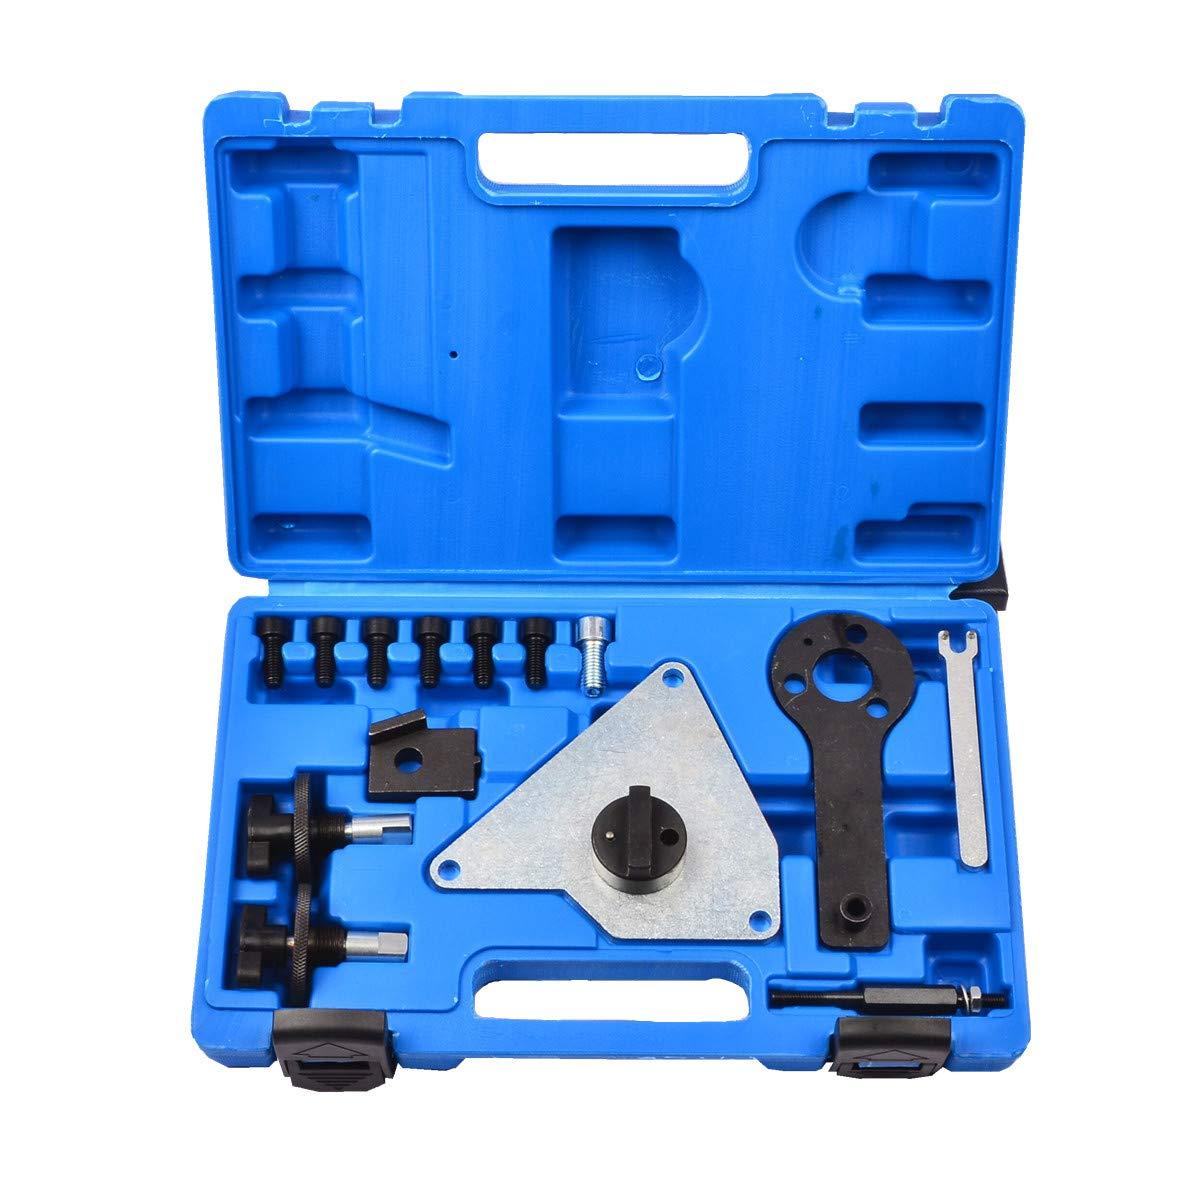 Prokomon Engine Timing Tool Kit for Alfa Romeo//Fiat Multiair 1.4L PT1836